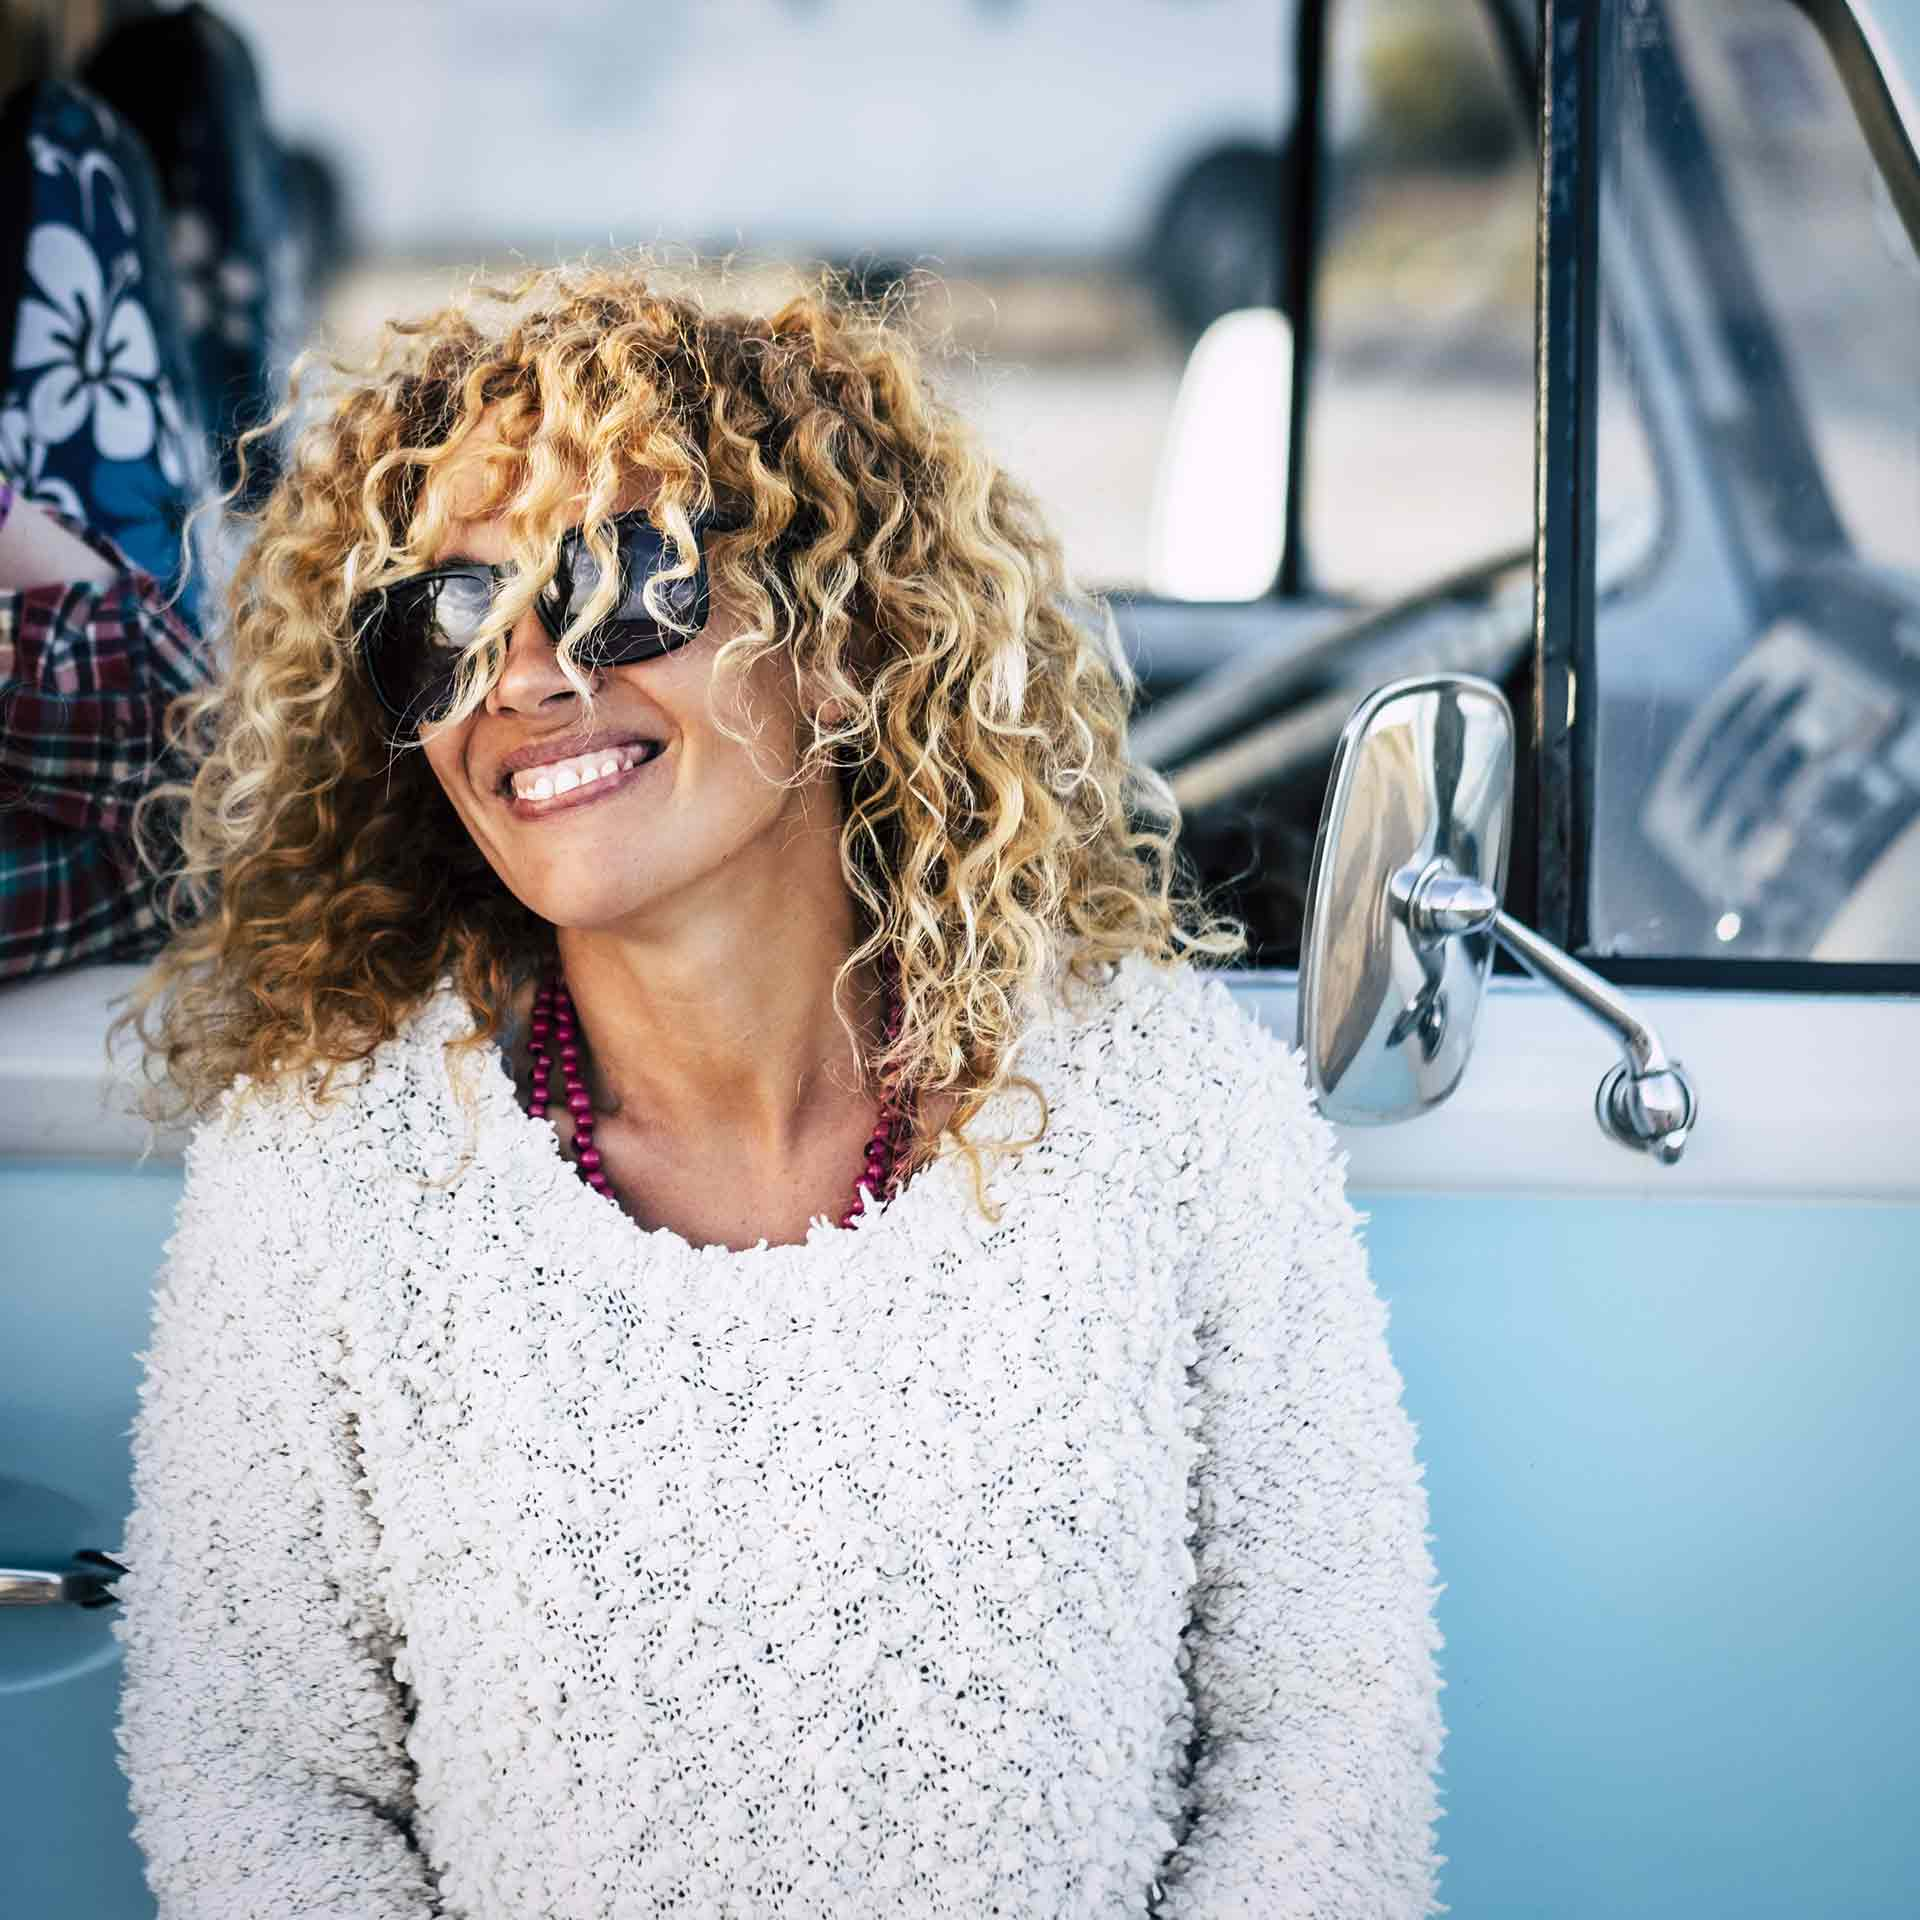 smiling-woman-live-happily-secrets